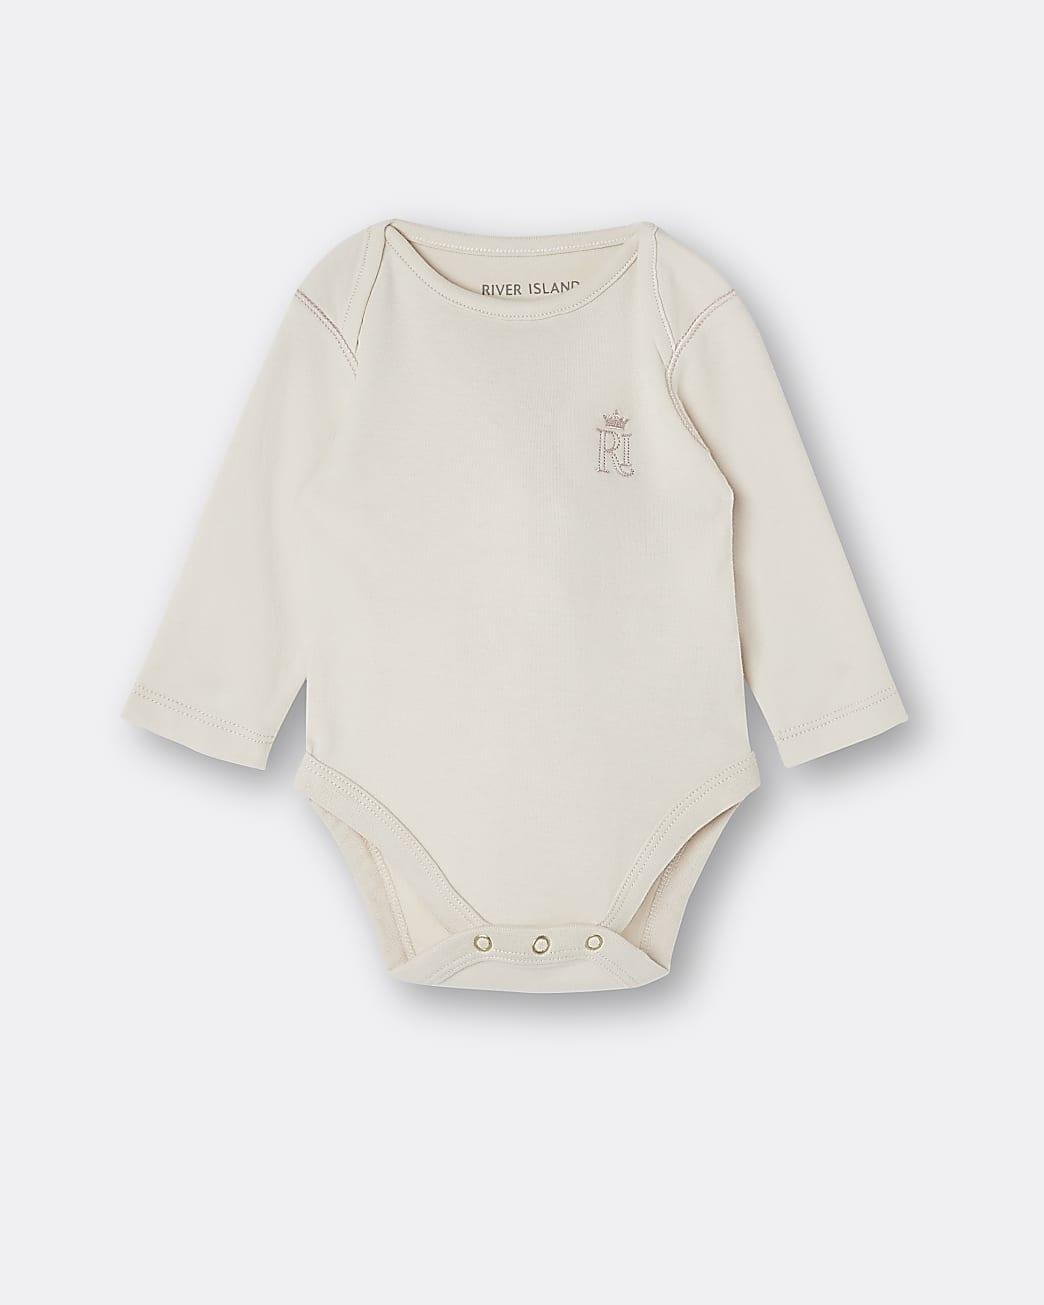 Baby beige RI embroidered babygrow